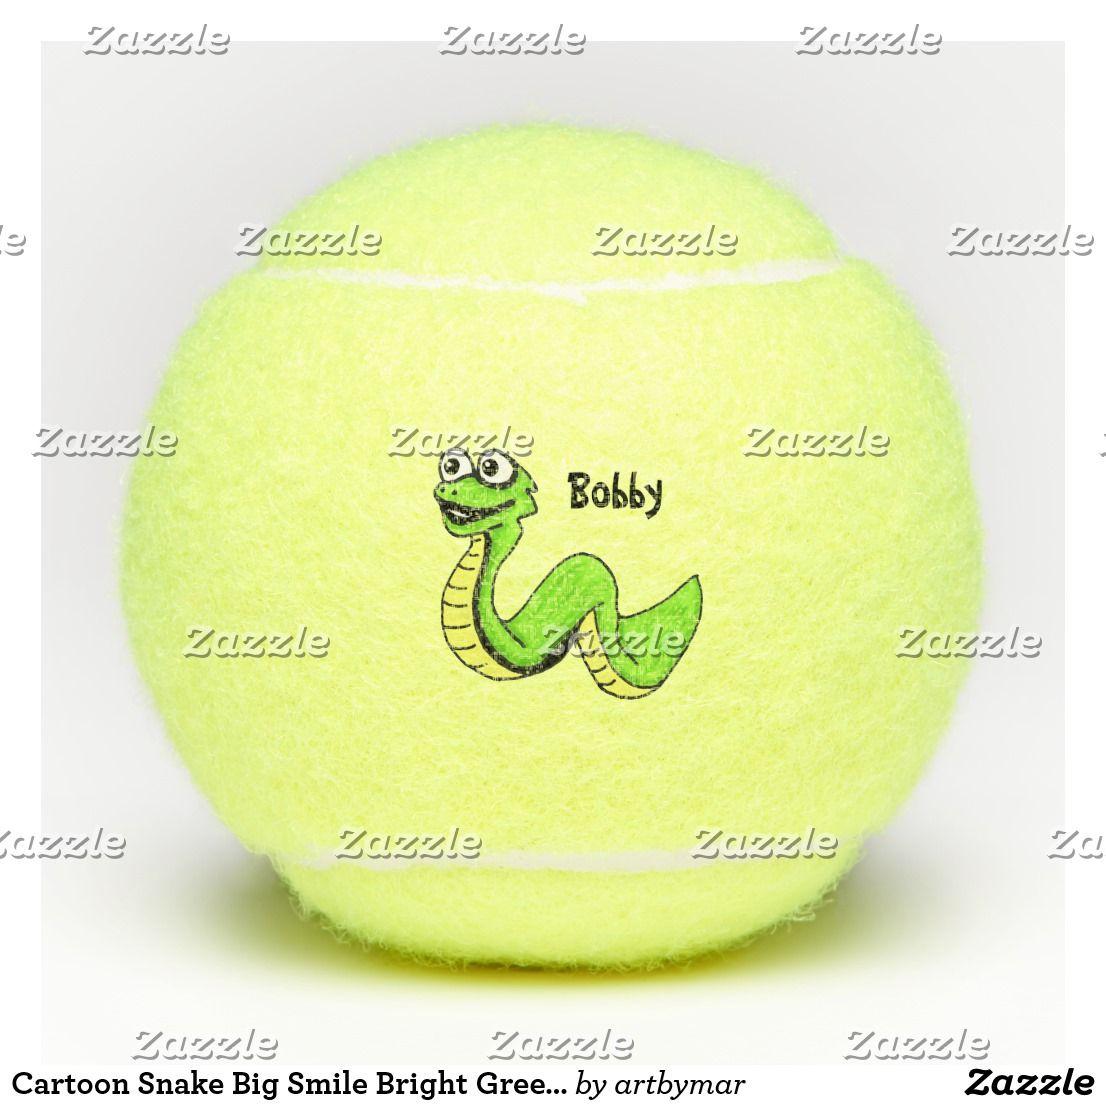 Cartoon Snake Big Smile Bright Green Yellow Tennis Balls Zazzle Com Tennis Balls Bright Green Tennis